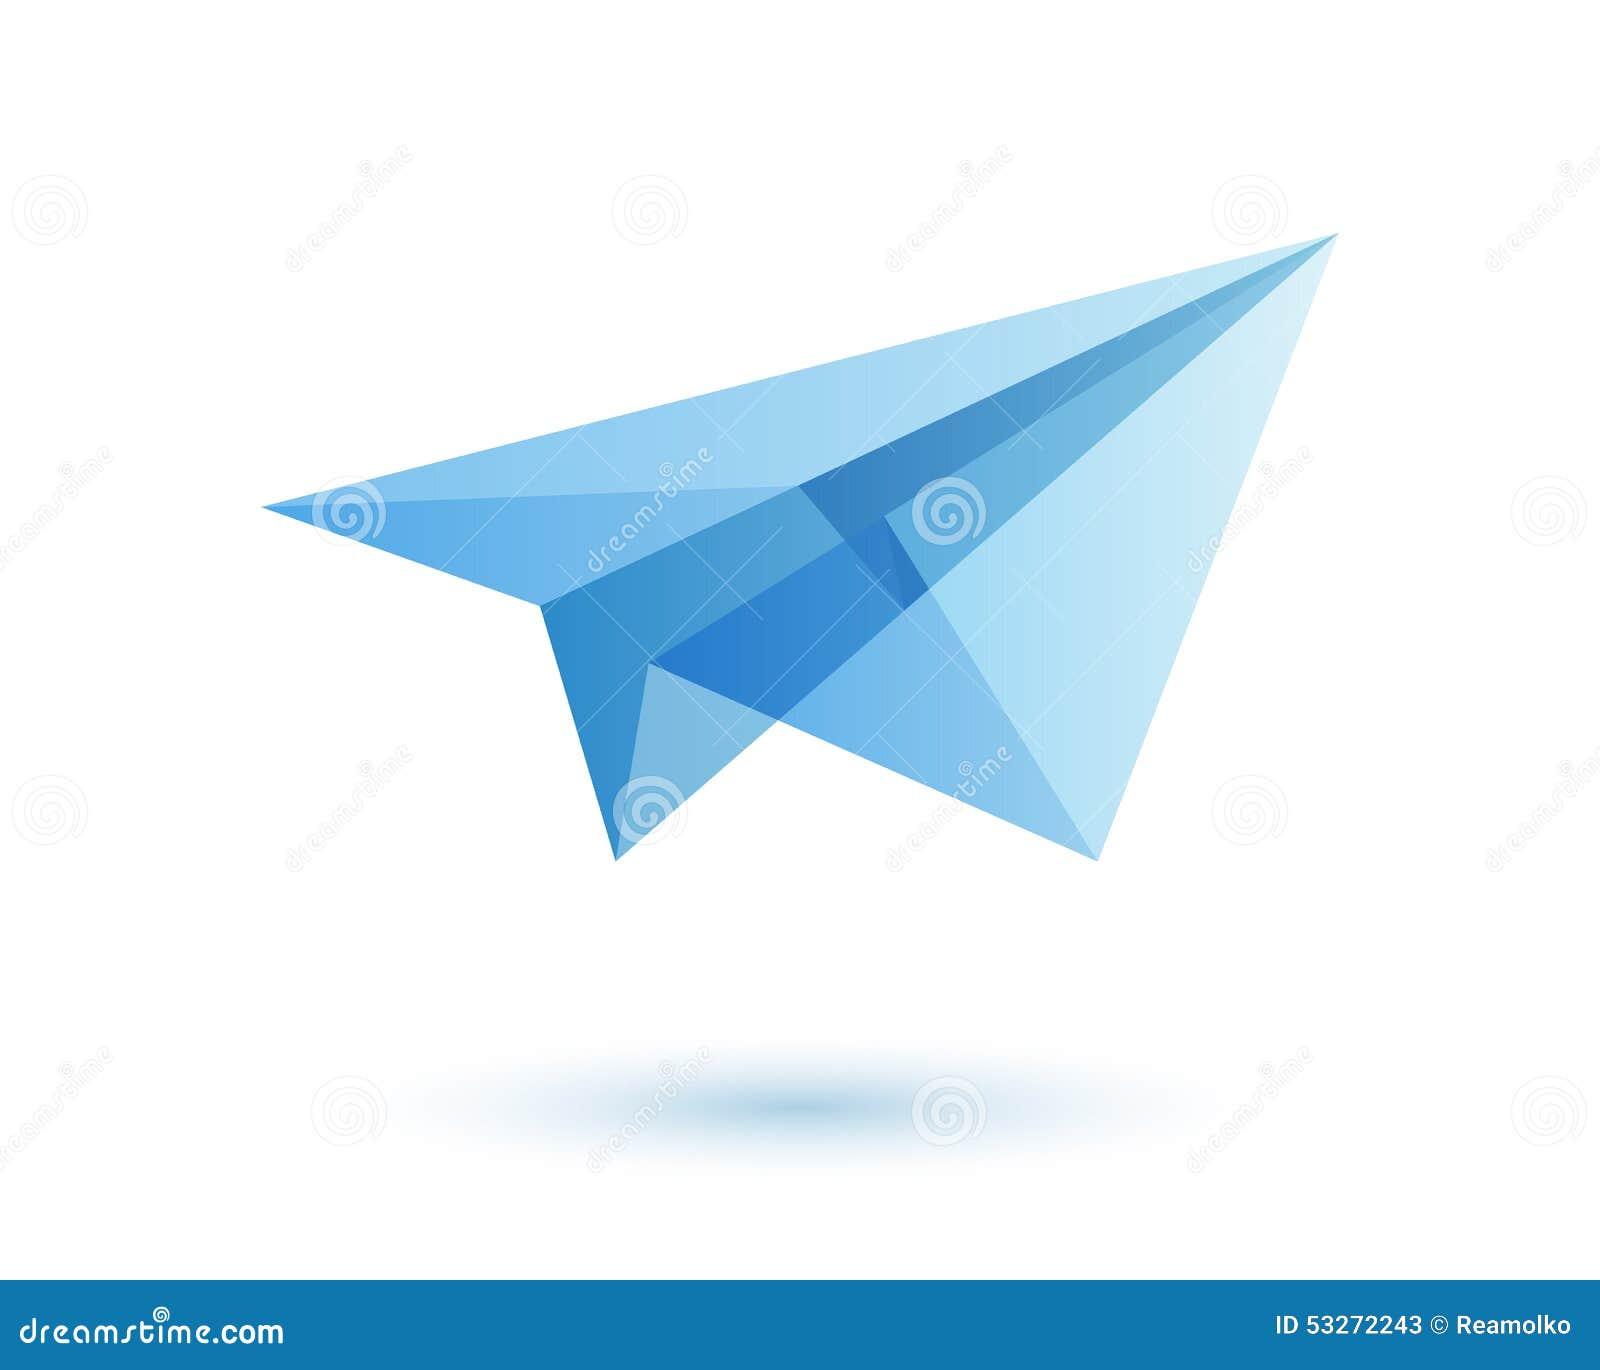 paper plane stock illustration - photo #11